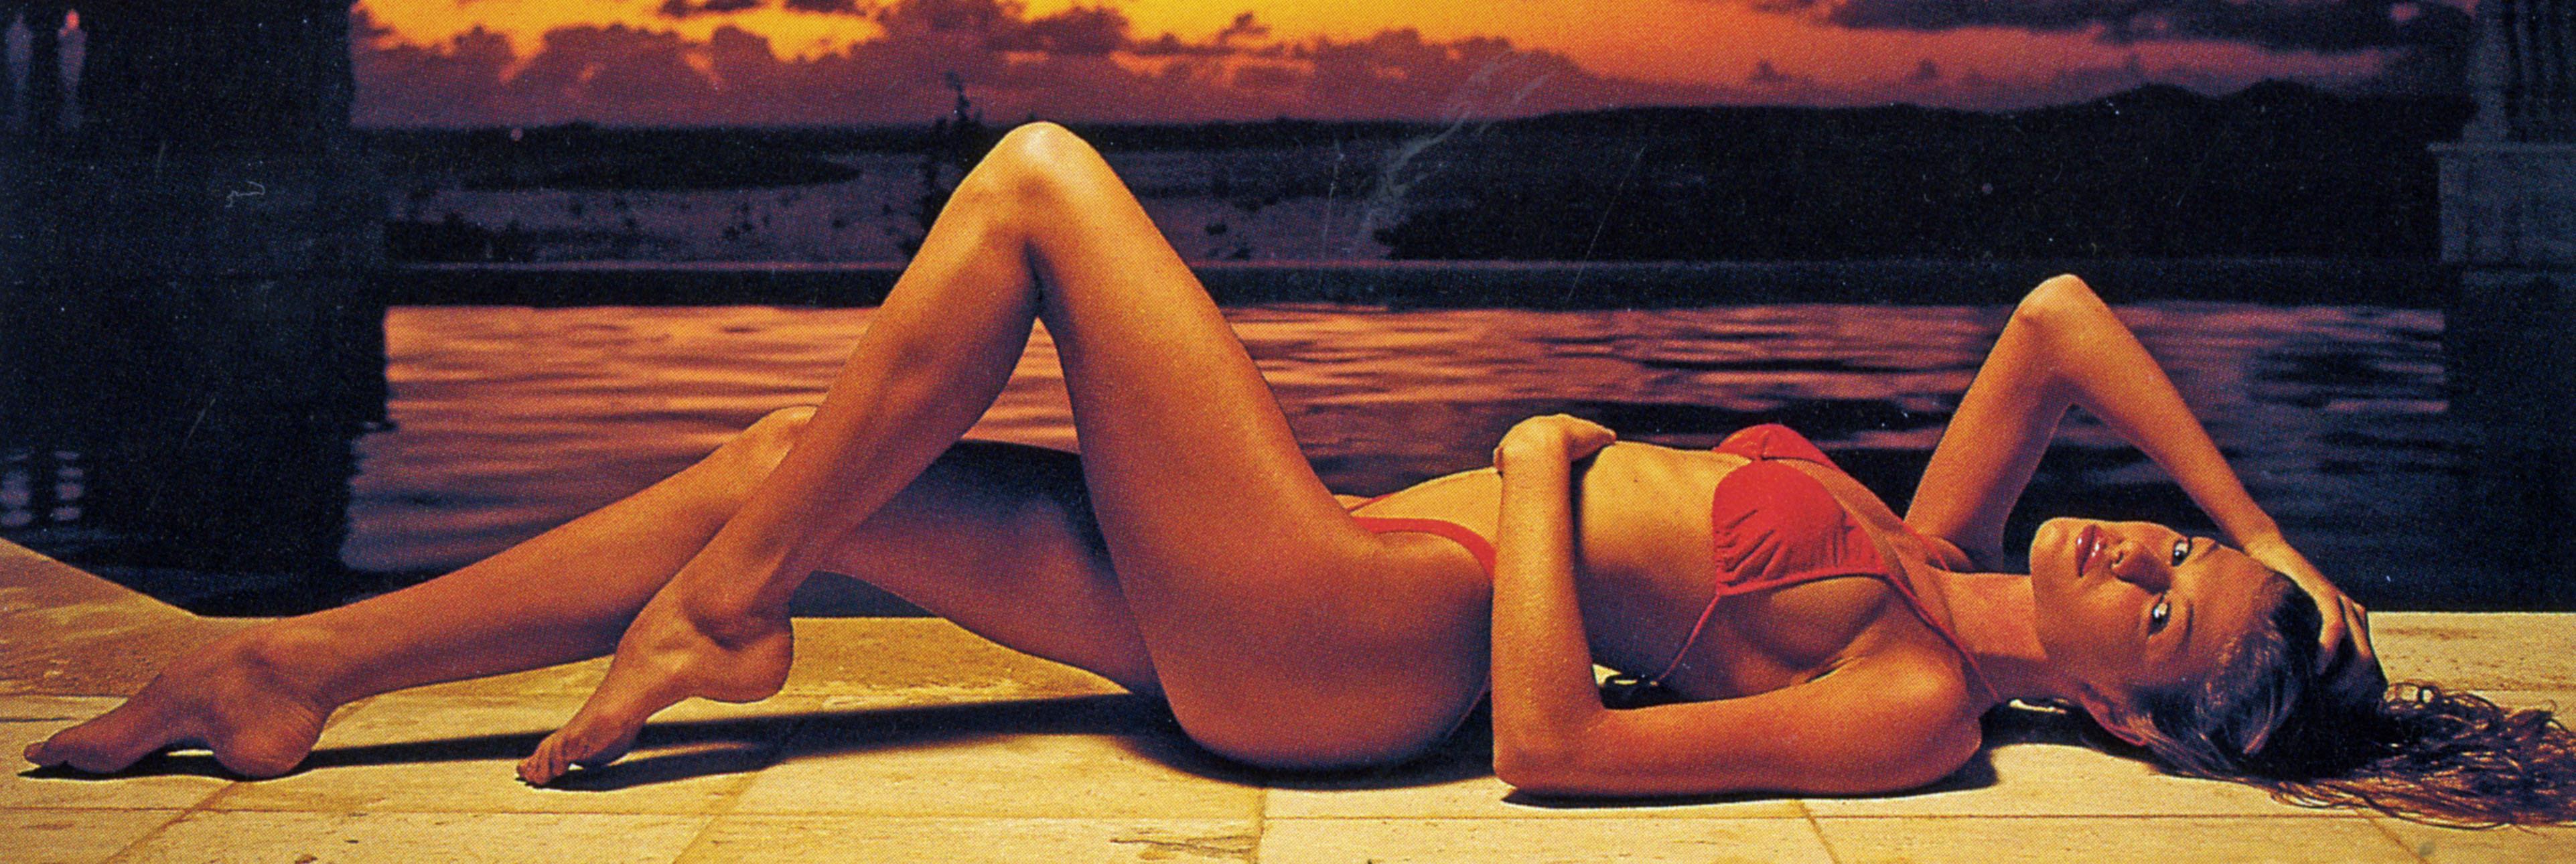 Ingrid Seynhaeve Nude Supermodel Search